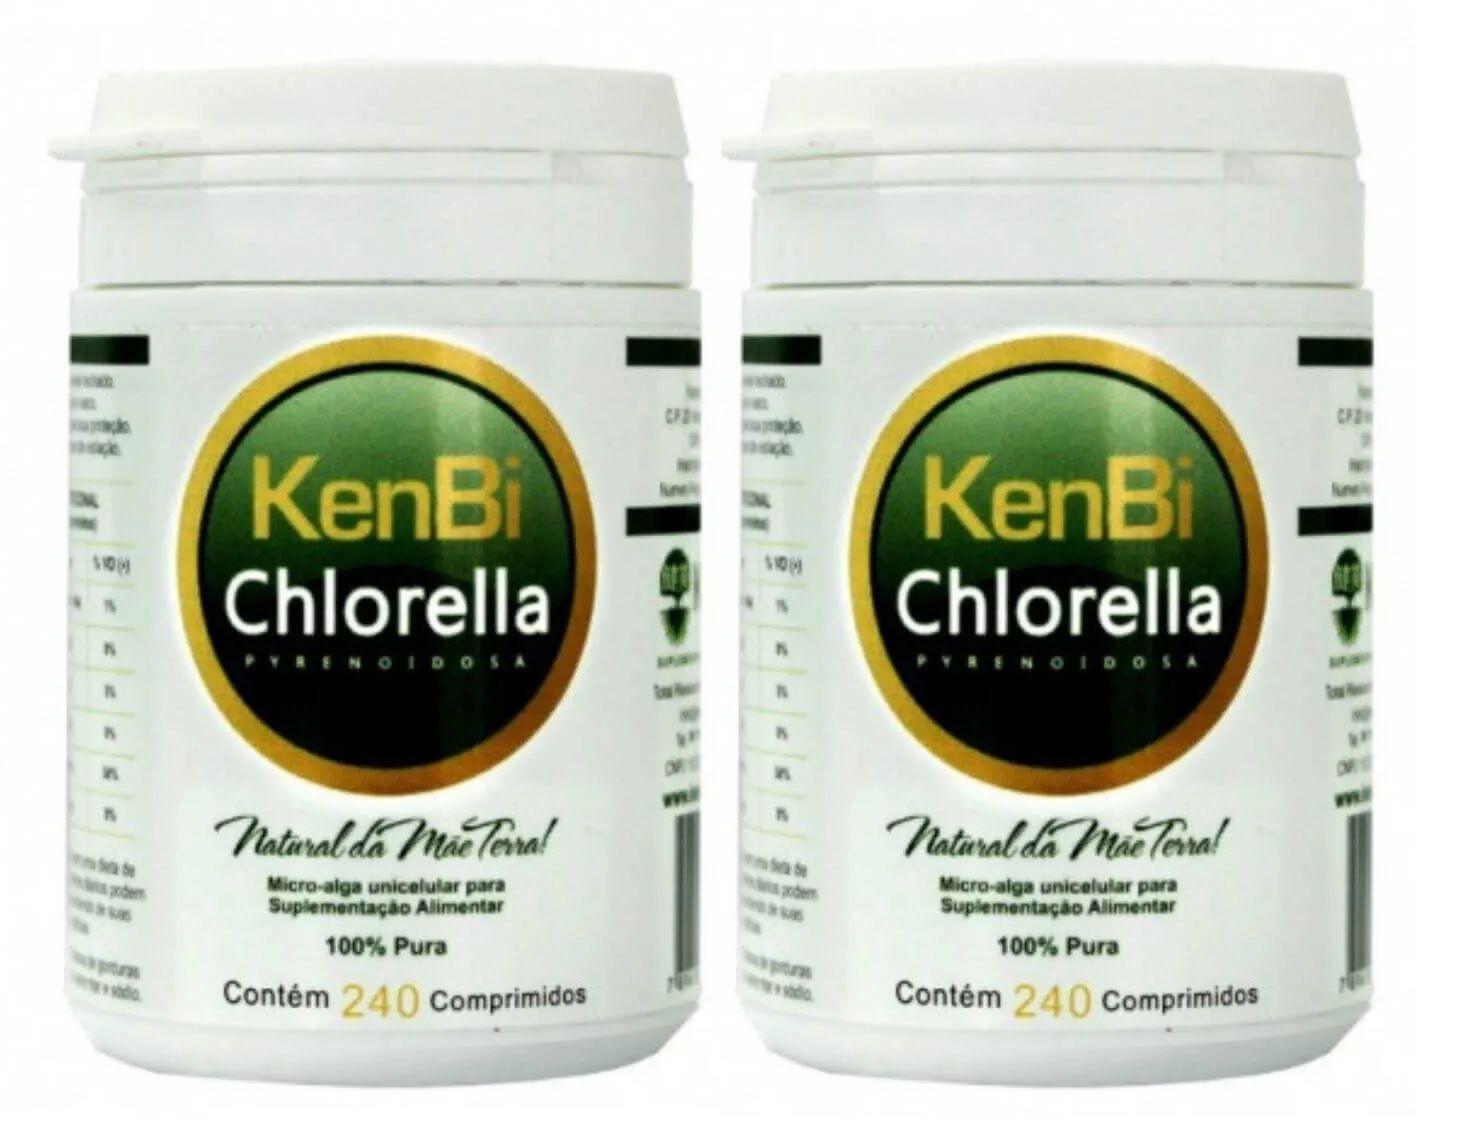 2x Chlorella Kenbi 240 Comprimidos 100% Chlorella - Total 480